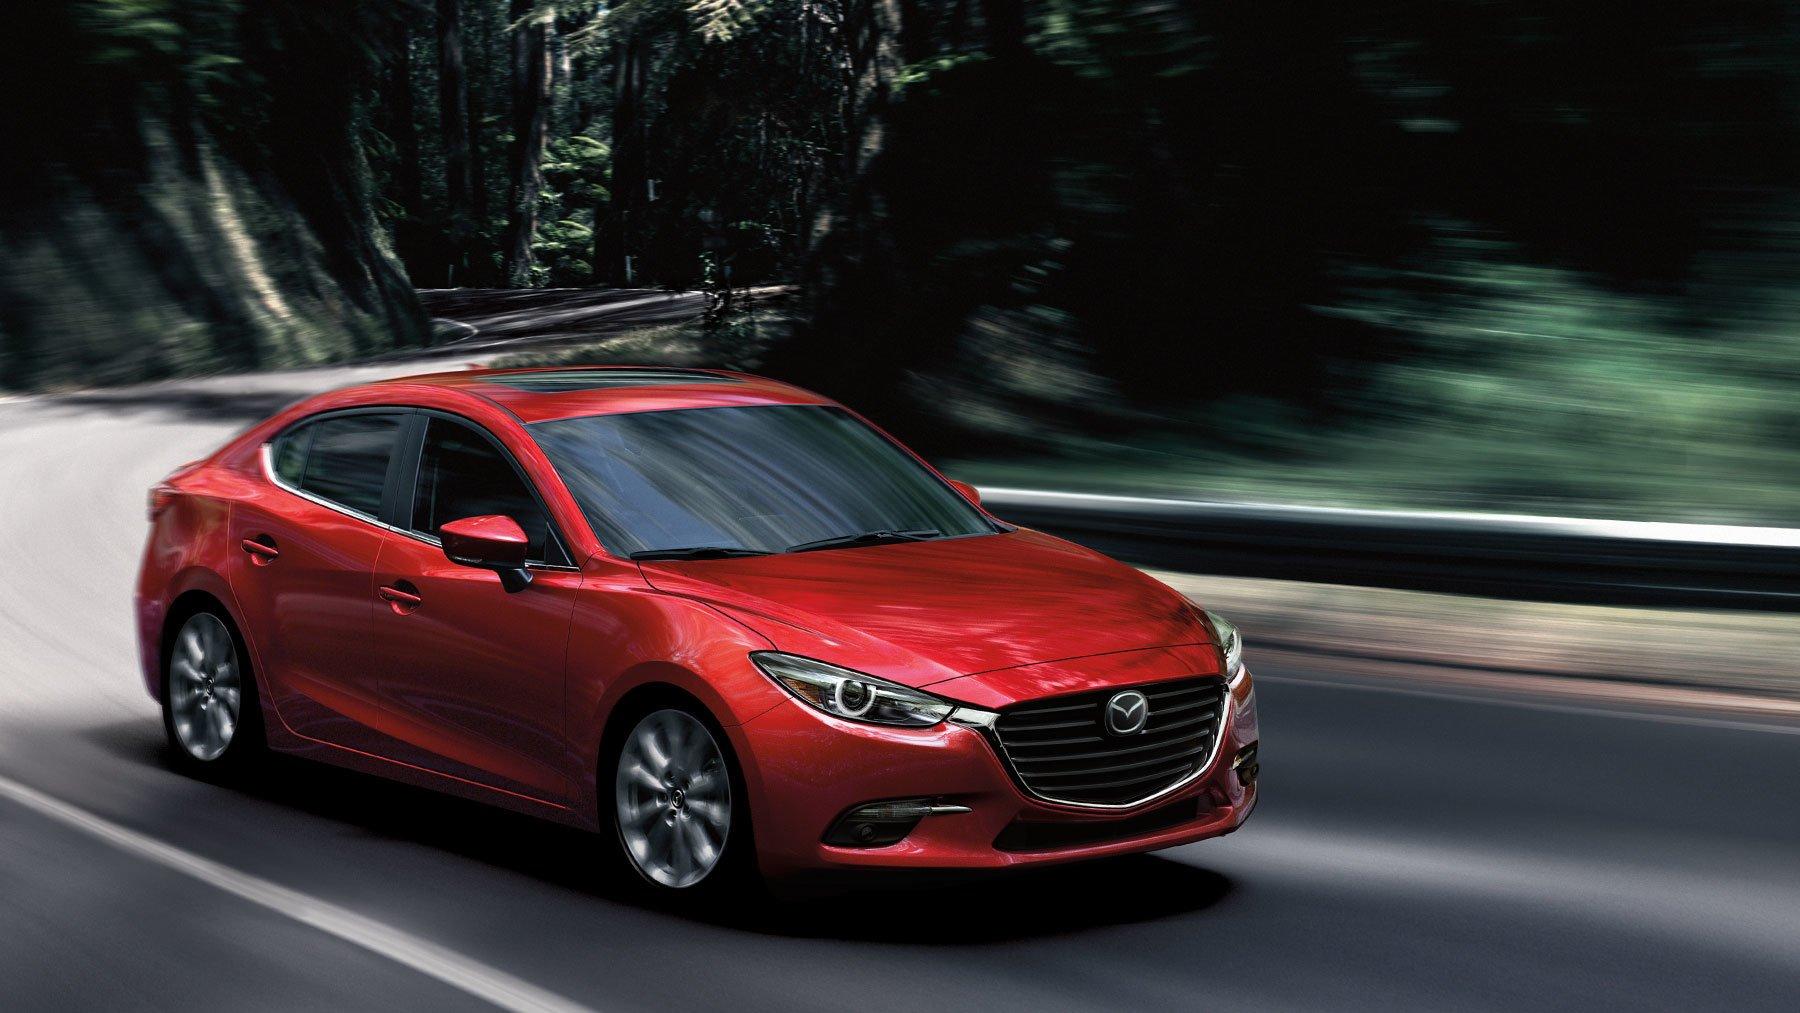 New Mazda MAZDA3 Exterior Features